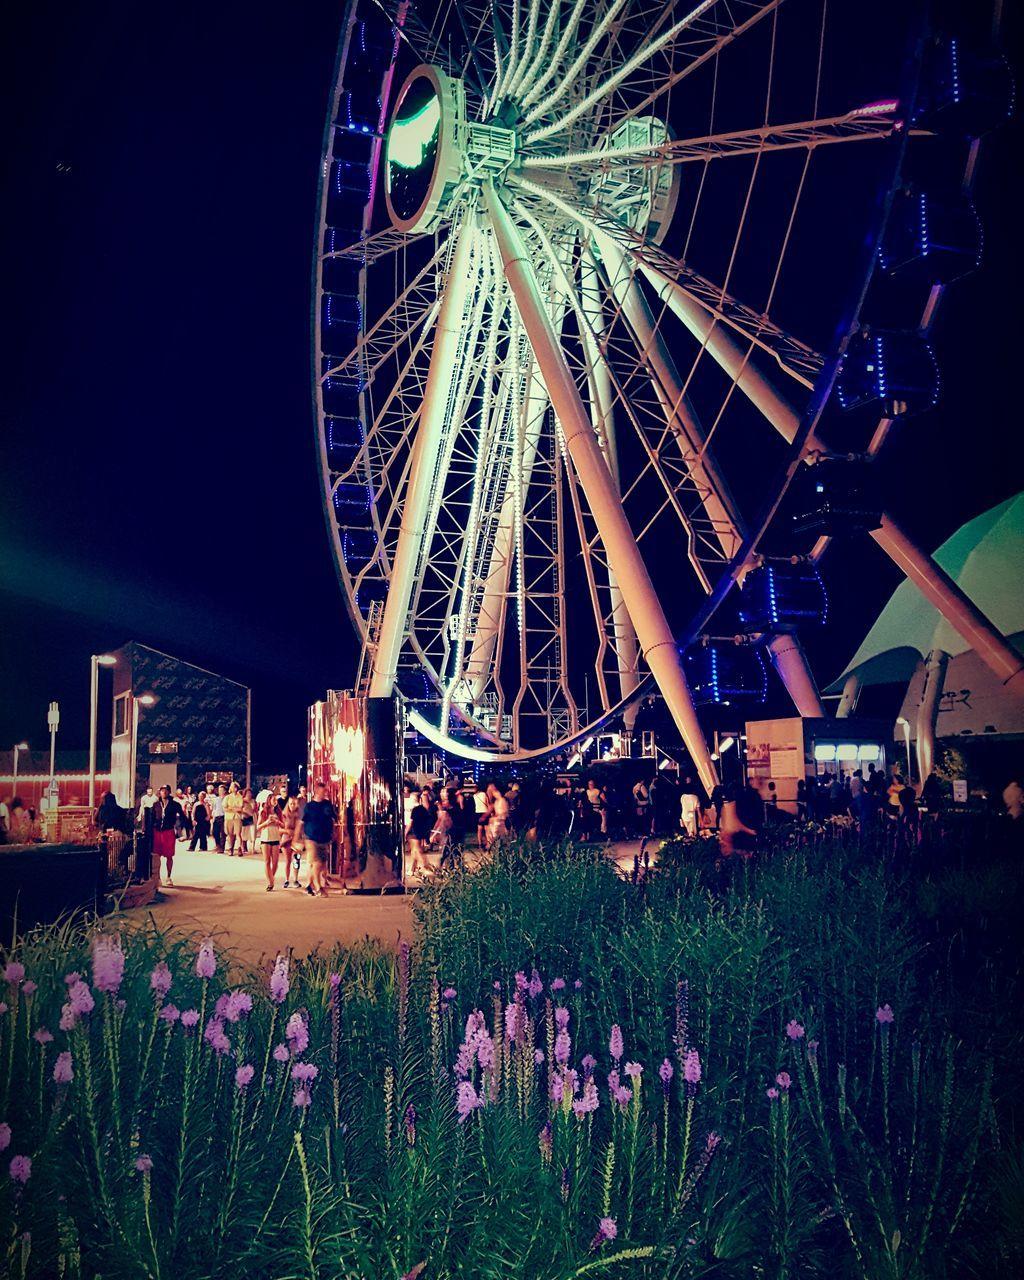 arts culture and entertainment, amusement park, leisure activity, ferris wheel, amusement park ride, outdoors, flower, fun, no people, night, nature, sky